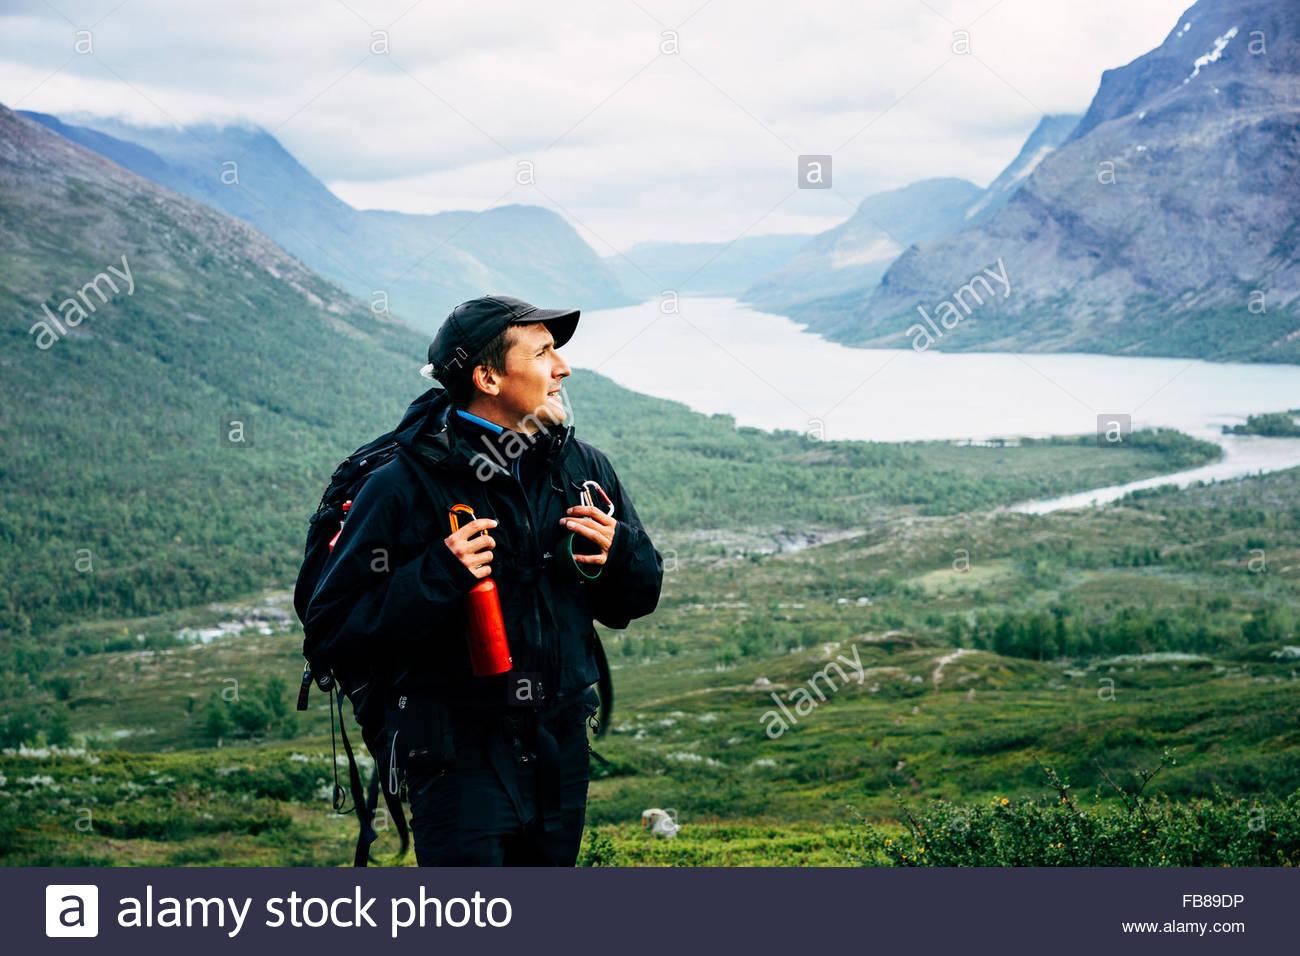 Sweden, Lapland, Kaitumjaure, Kungsleden, Male hiker in mountain valley - Stock Image